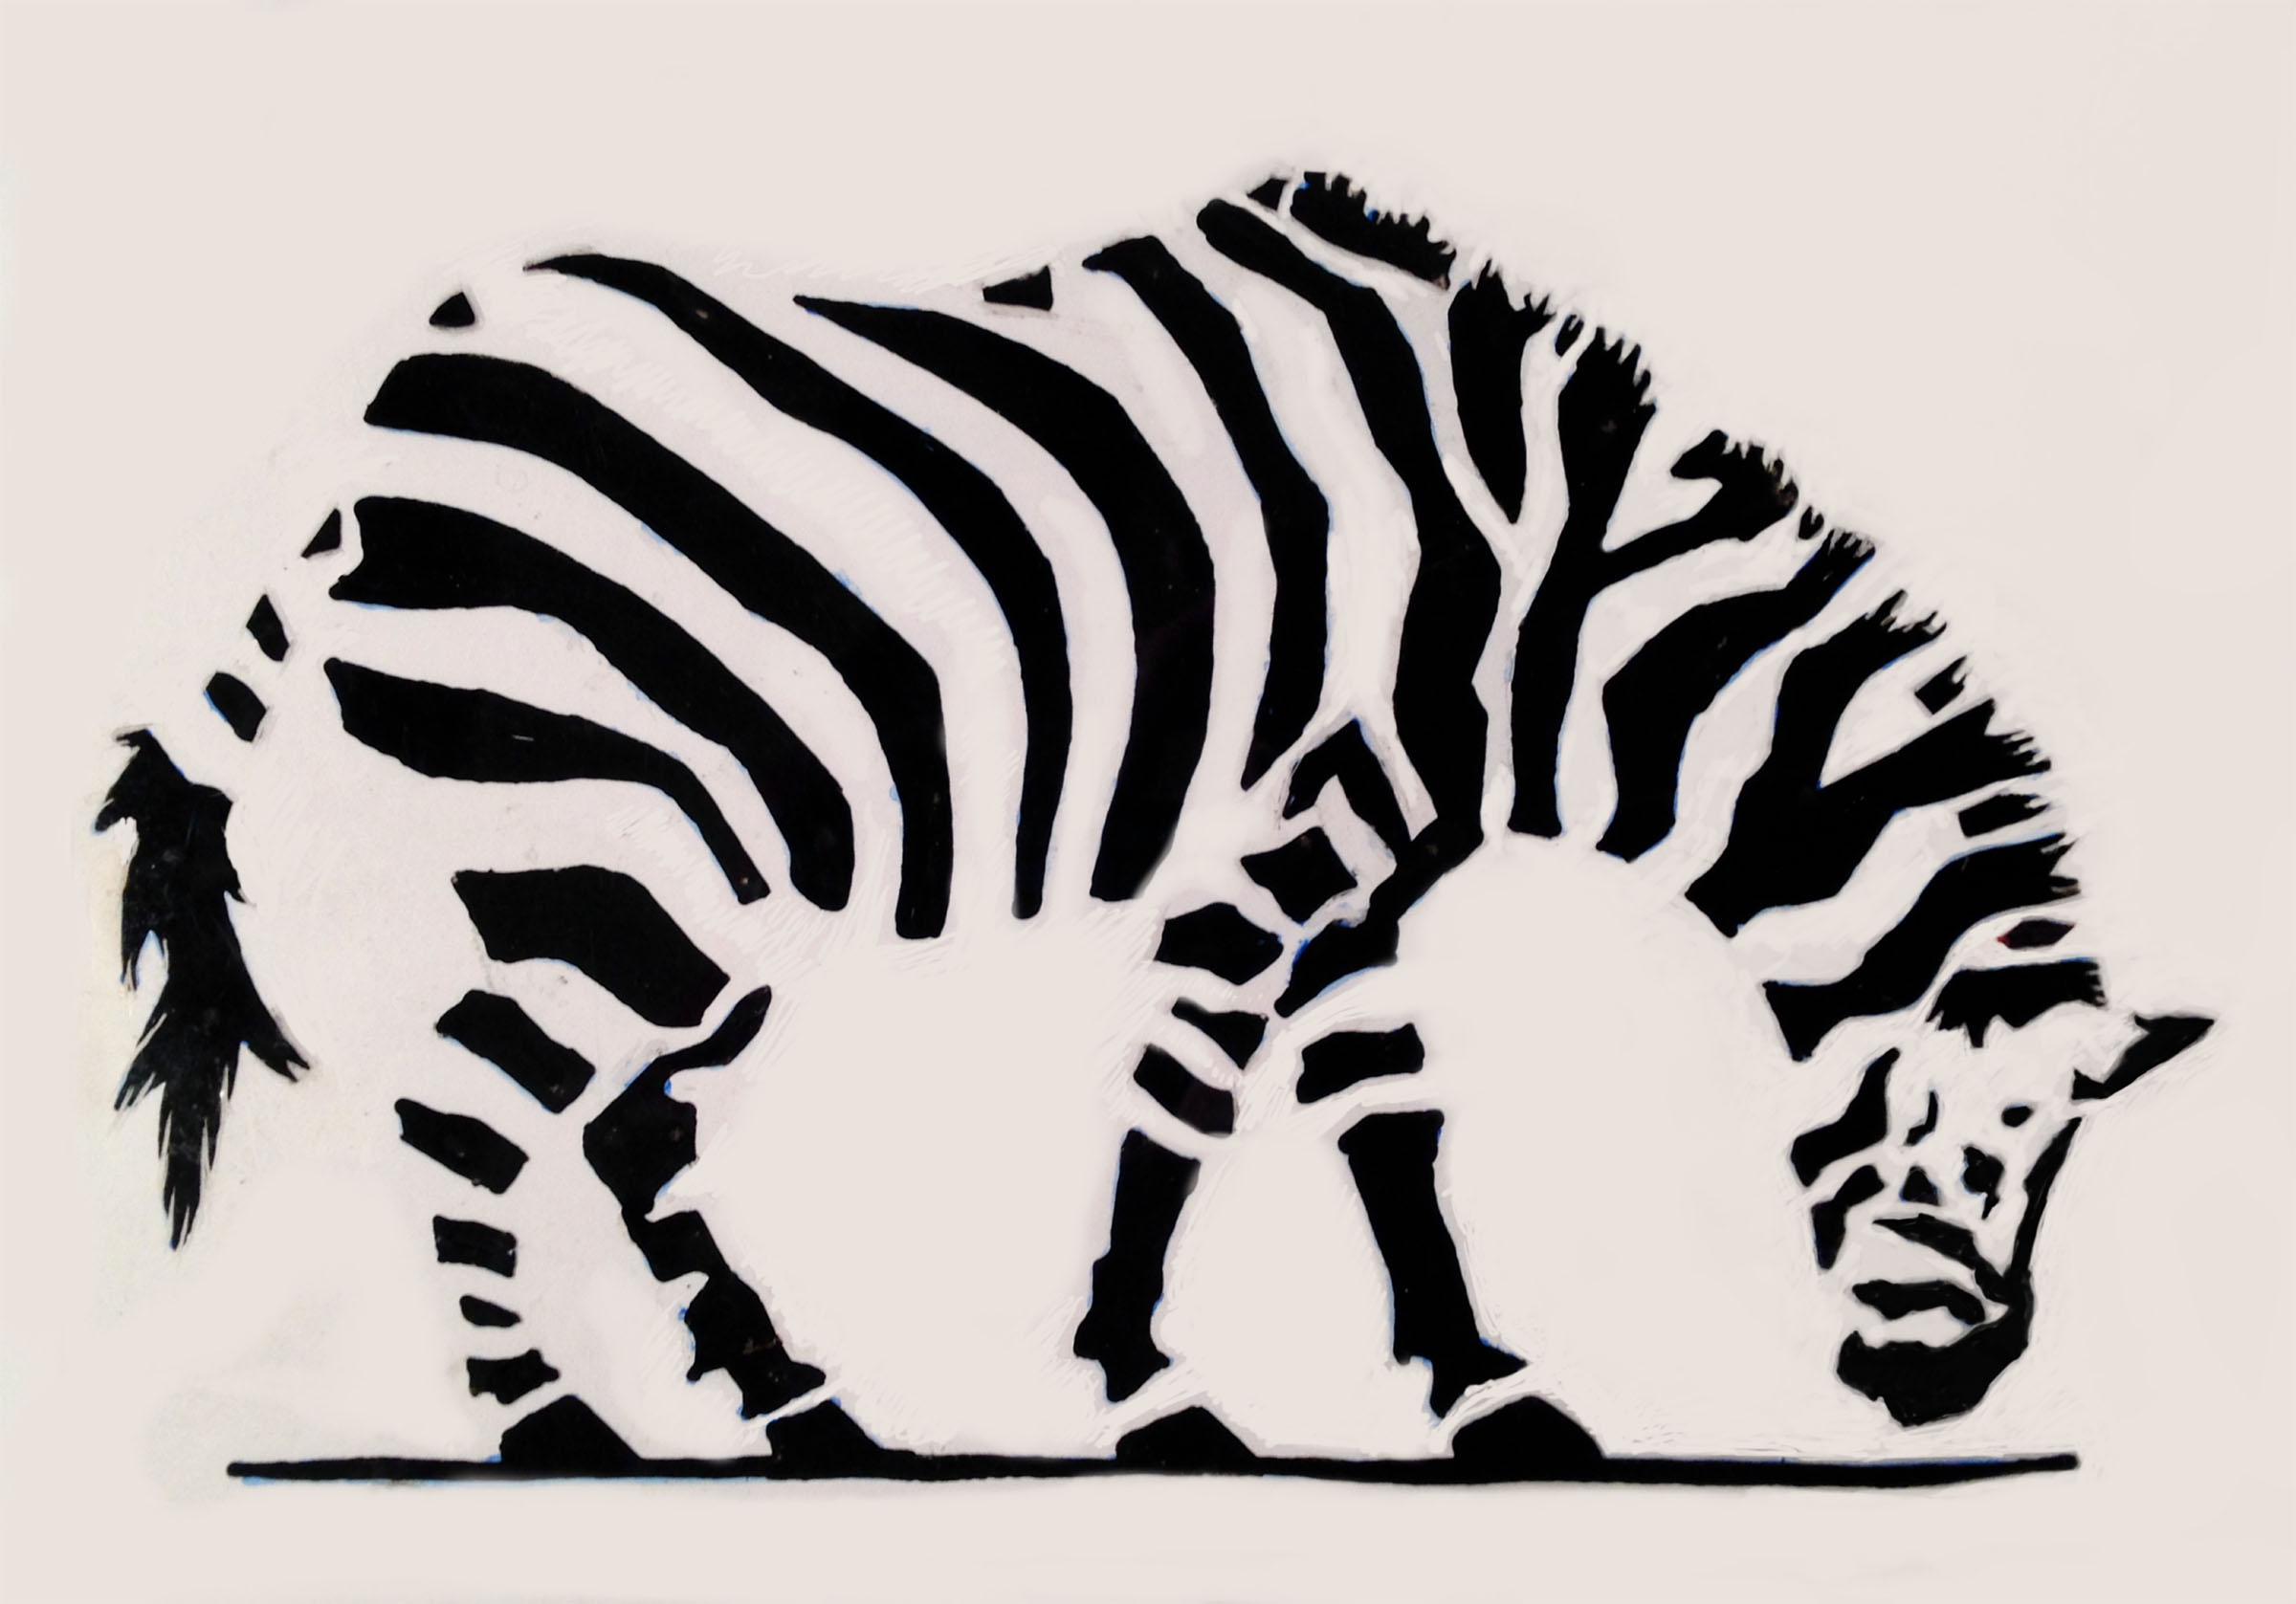 Zebra , 2016.  Giclee print on Photographique paper.